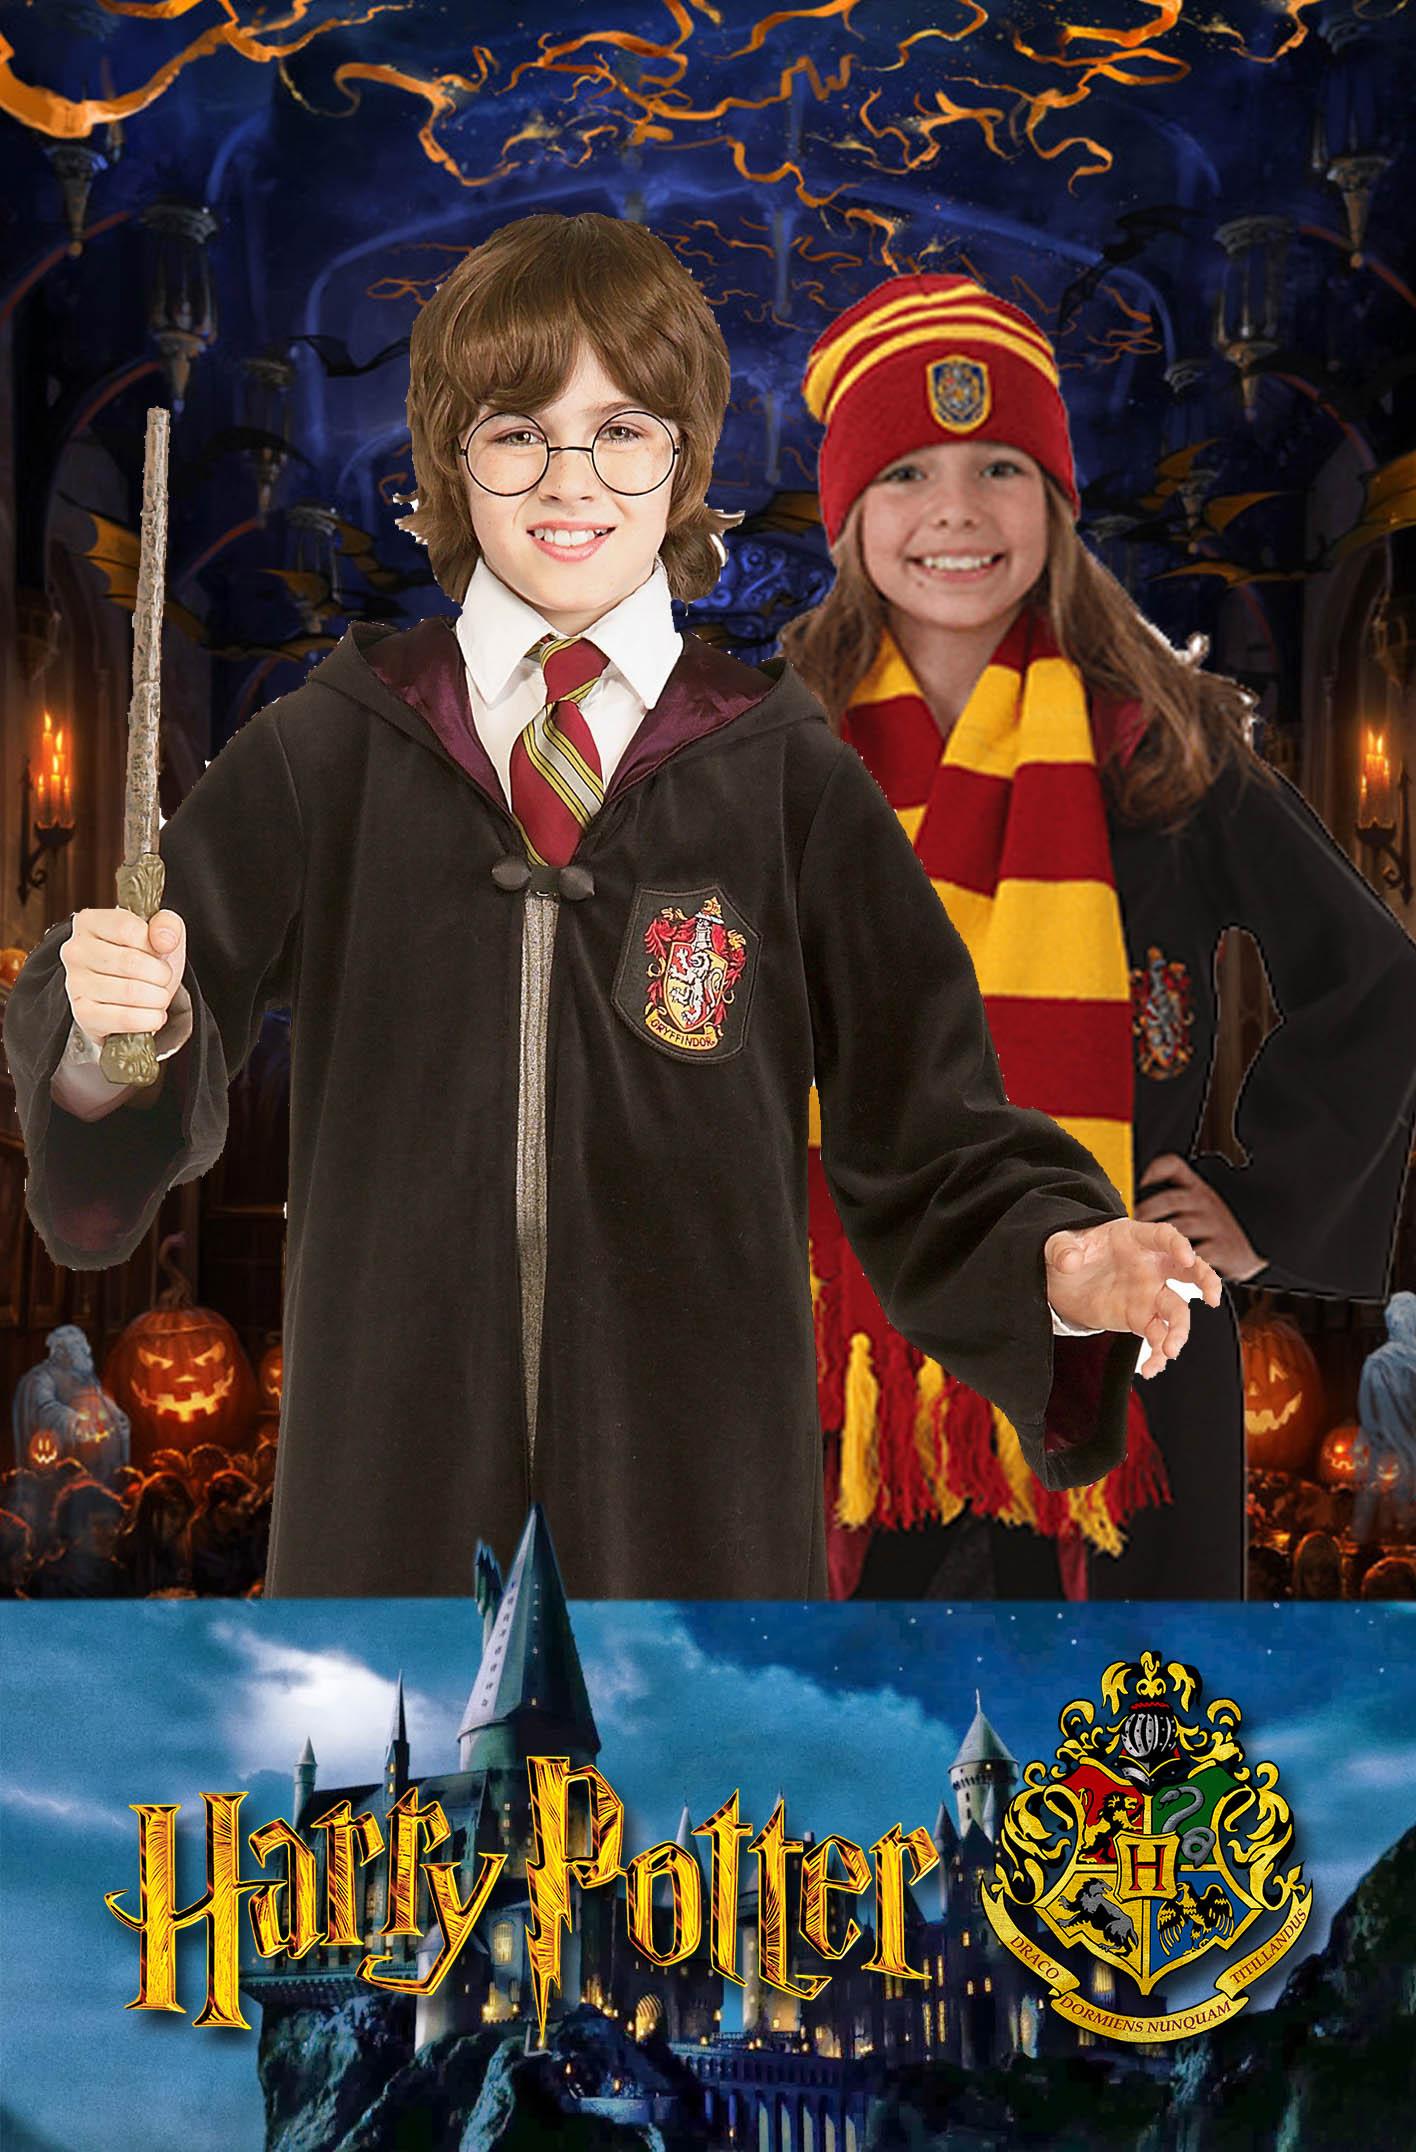 HarryPotter1.JPG